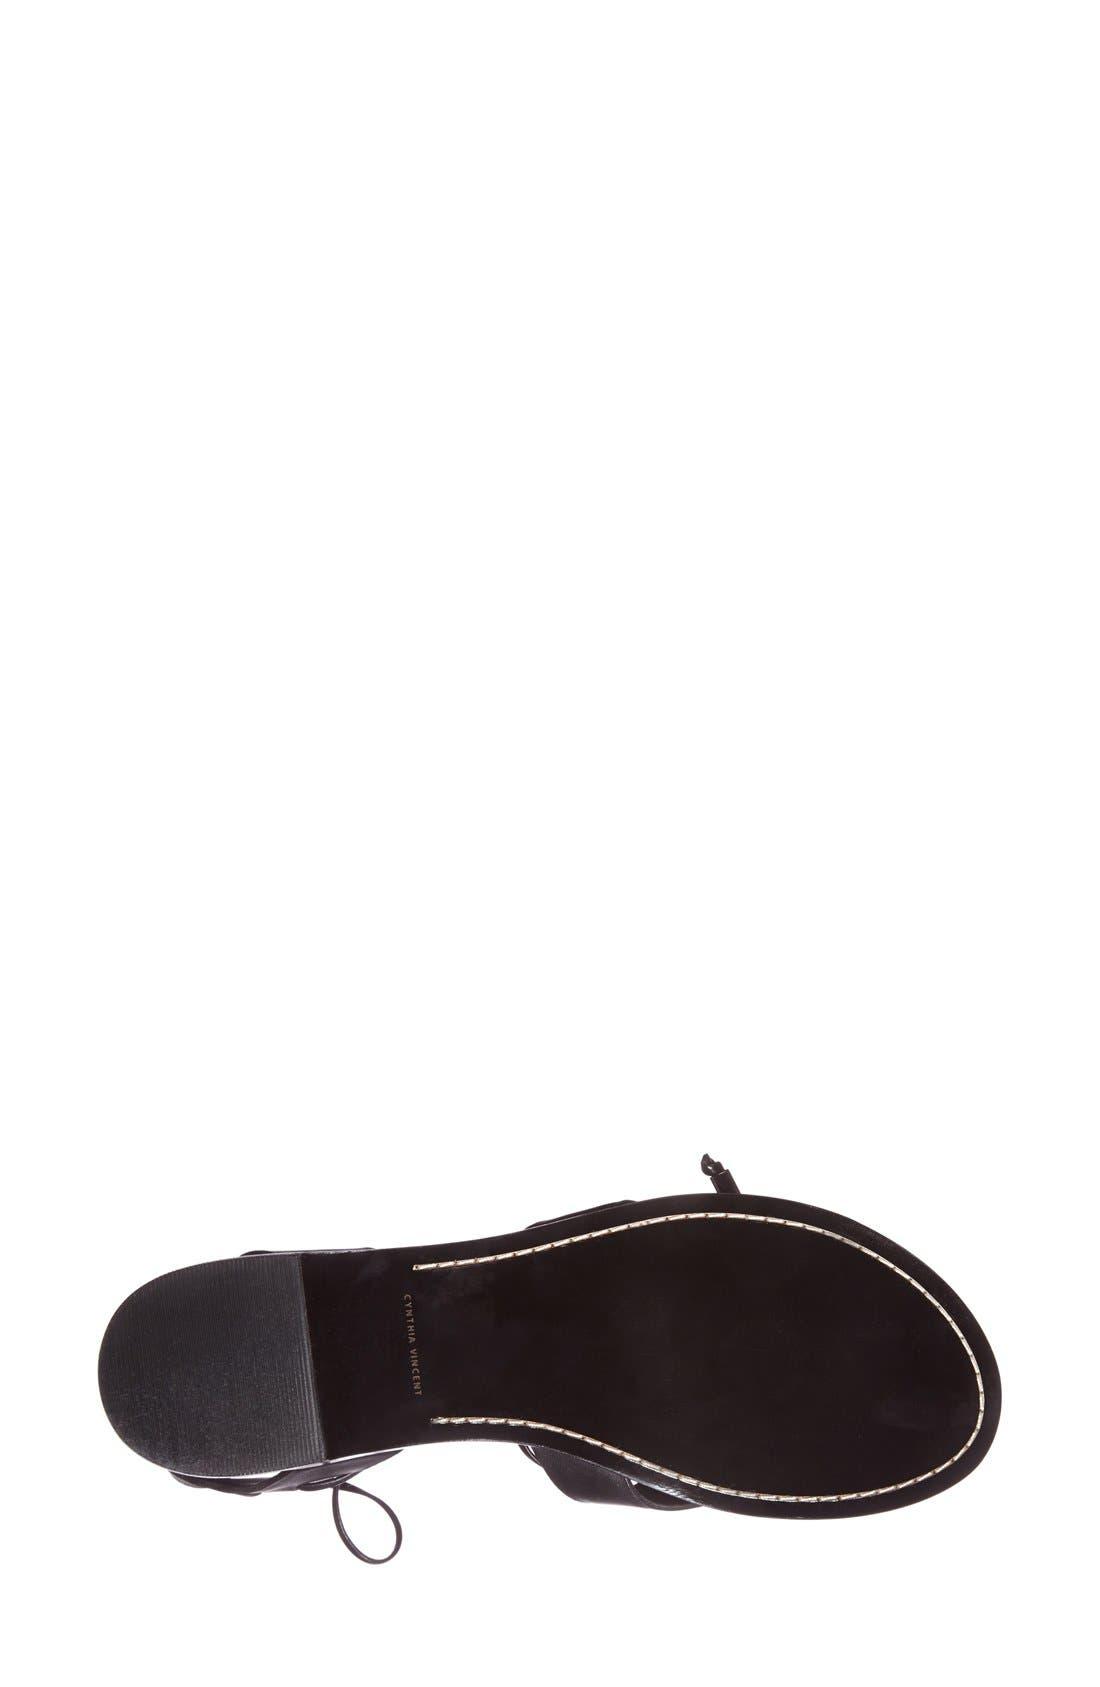 Alternate Image 4  - Cynthia Vincent 'Fantine' Leather Gladiator Sandal (Women)